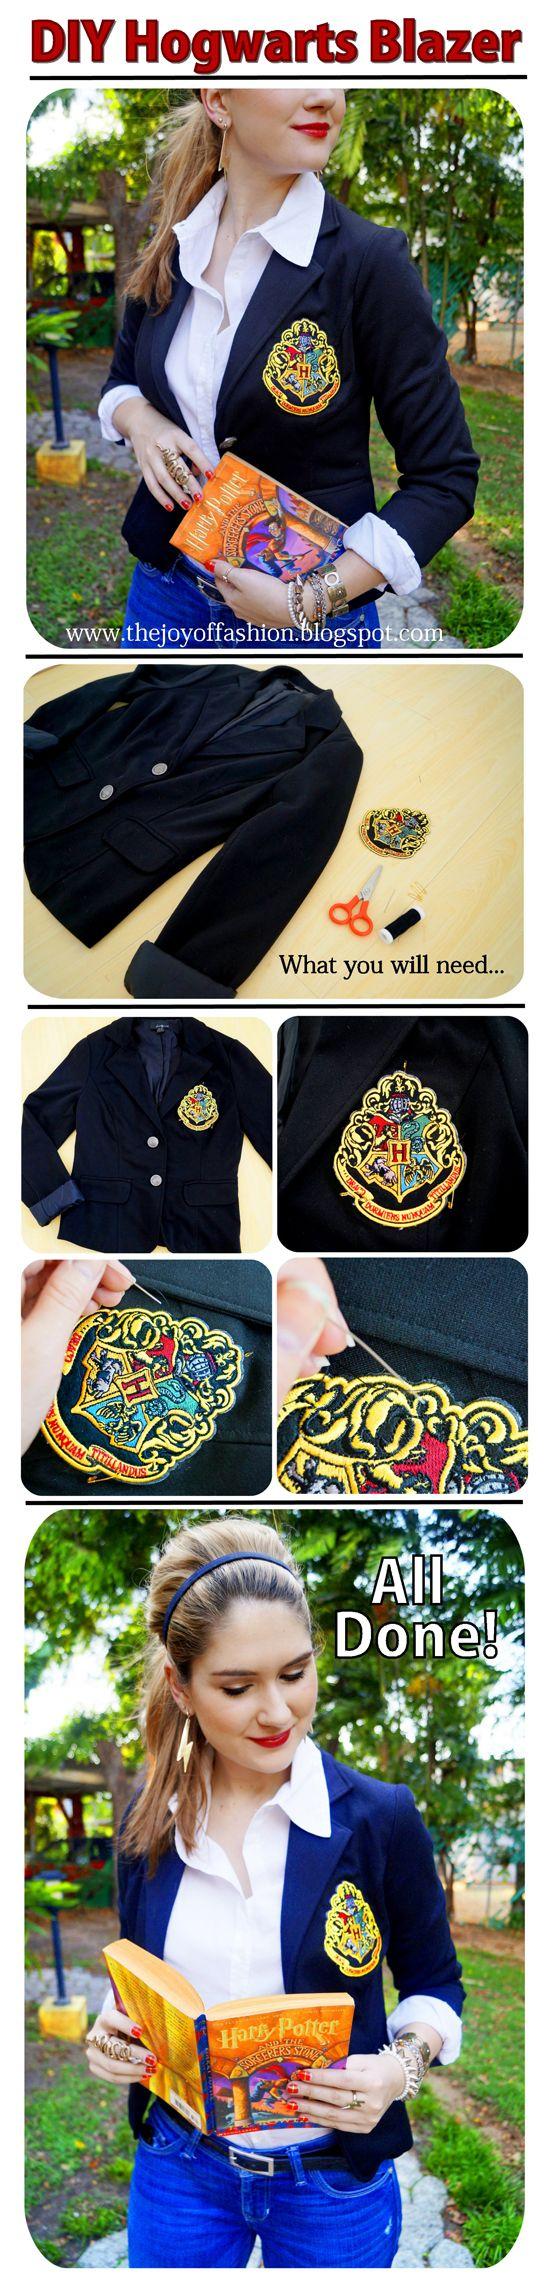 DIY Harry Potter Hogwarts Blazer